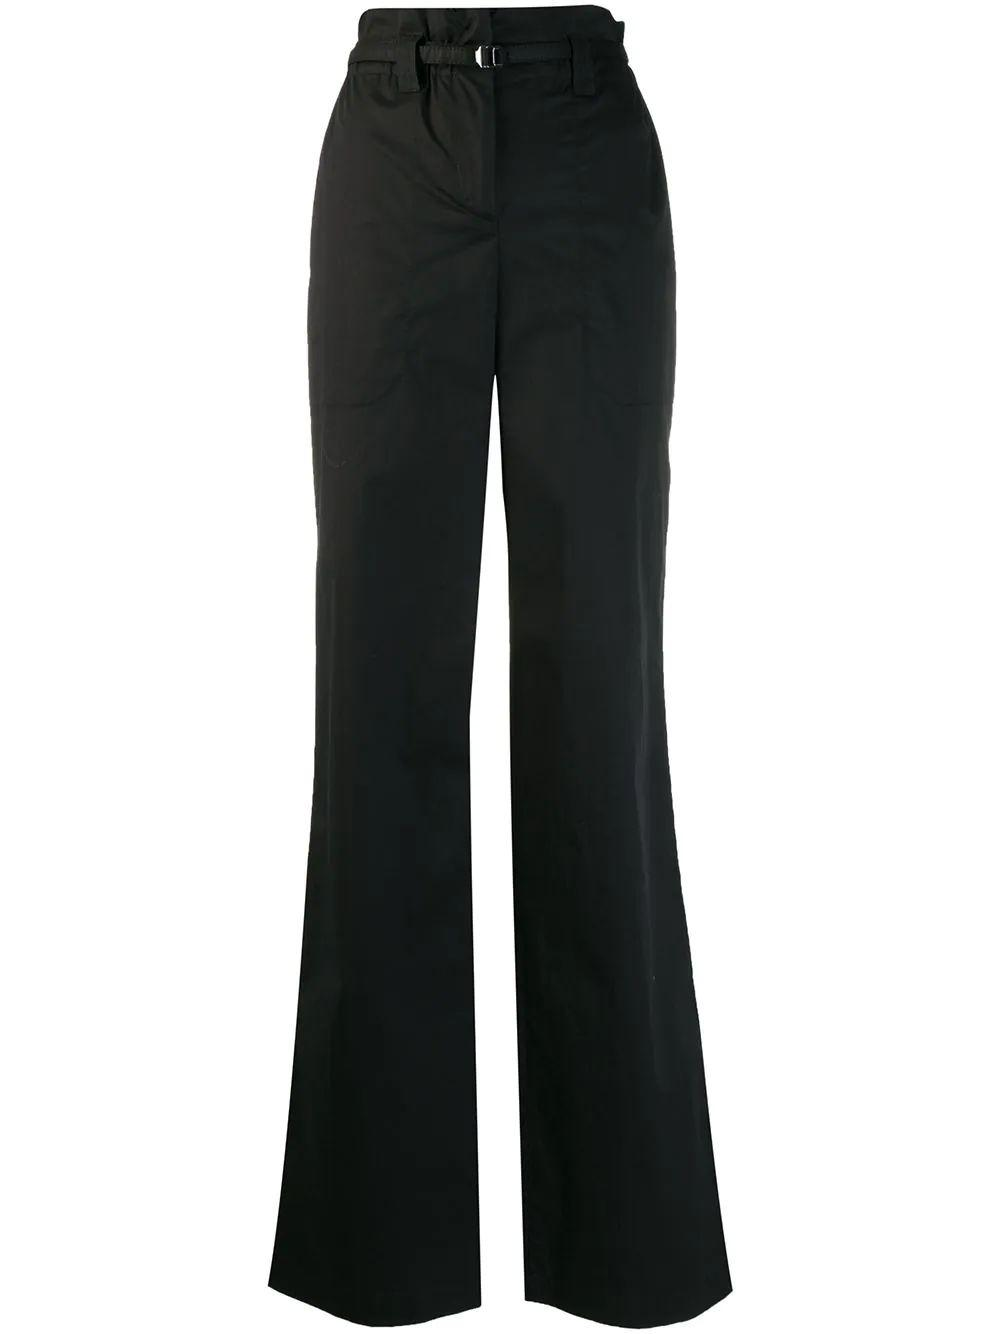 Technical Comfort Pants Item # 213-440603